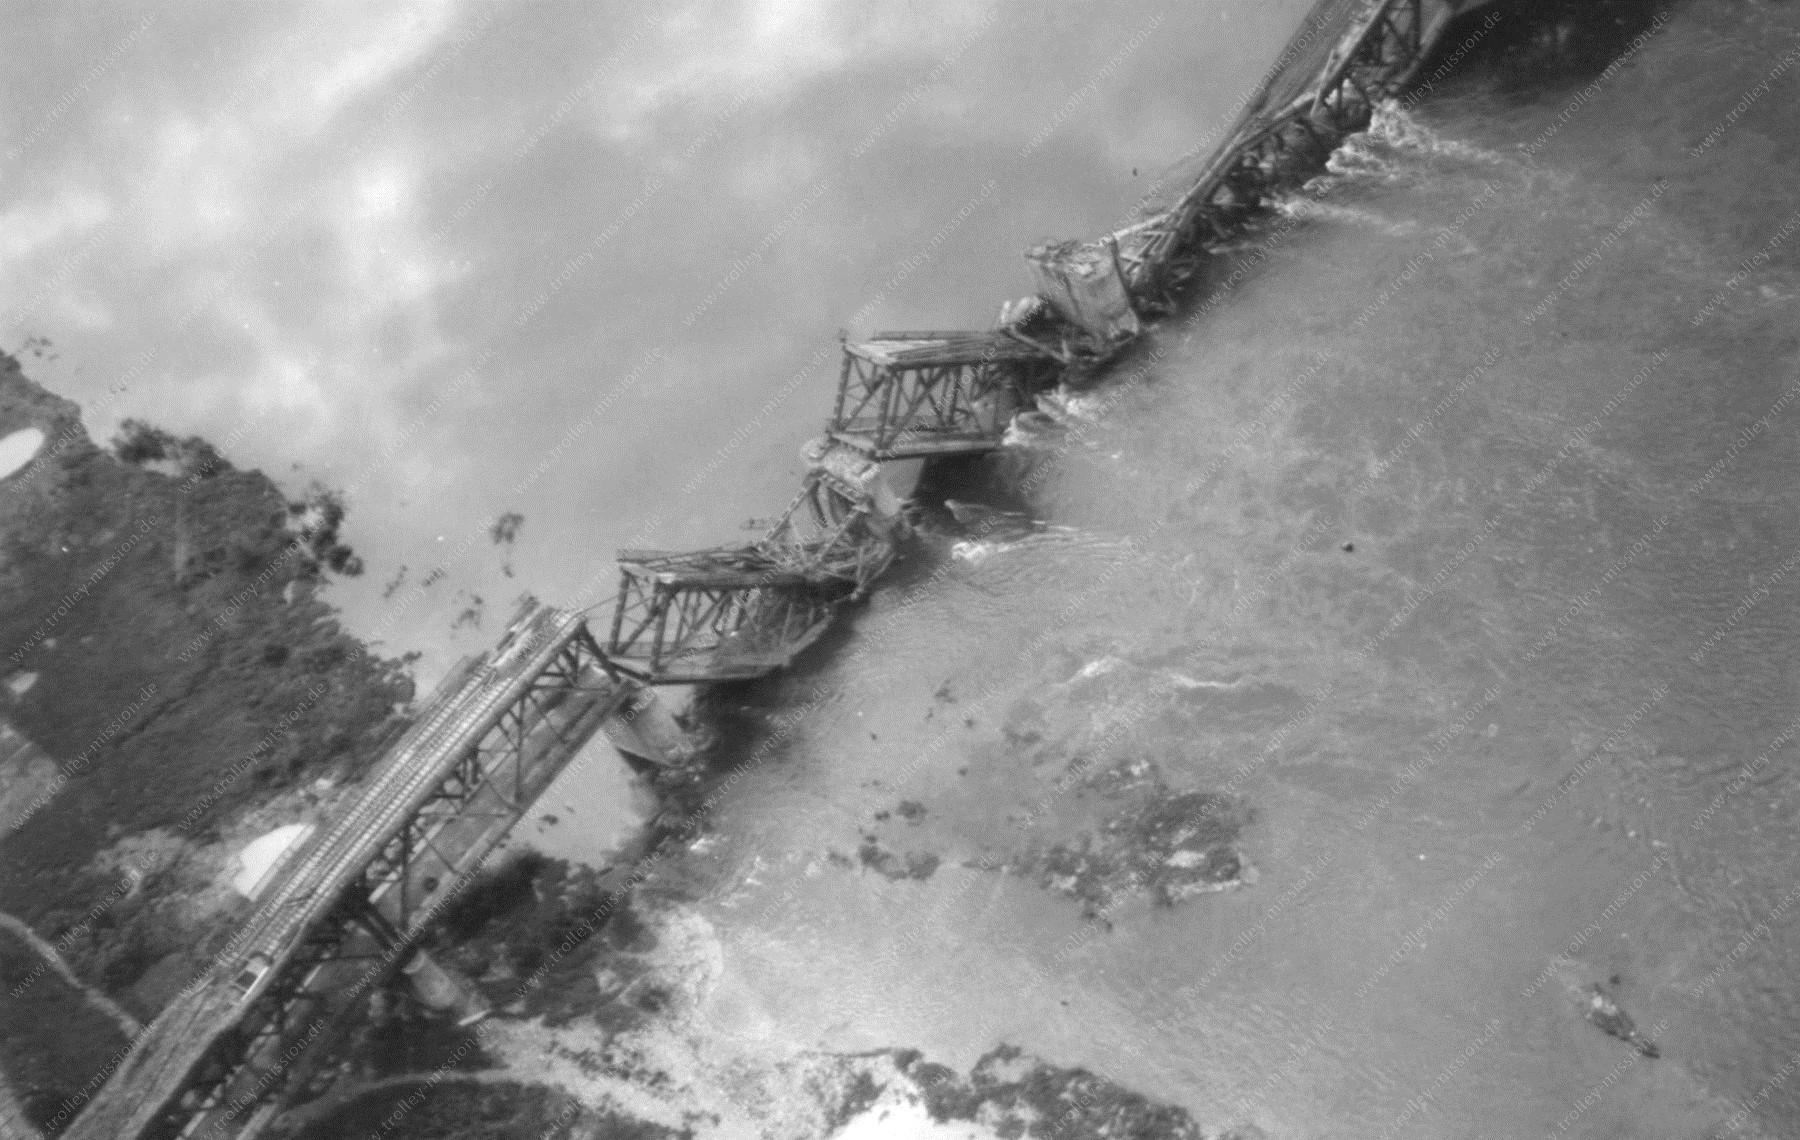 Moselbrücke Bullay (Doppelstockbrücke Alf-Bullay) nach dem Zweiten Weltkrieg